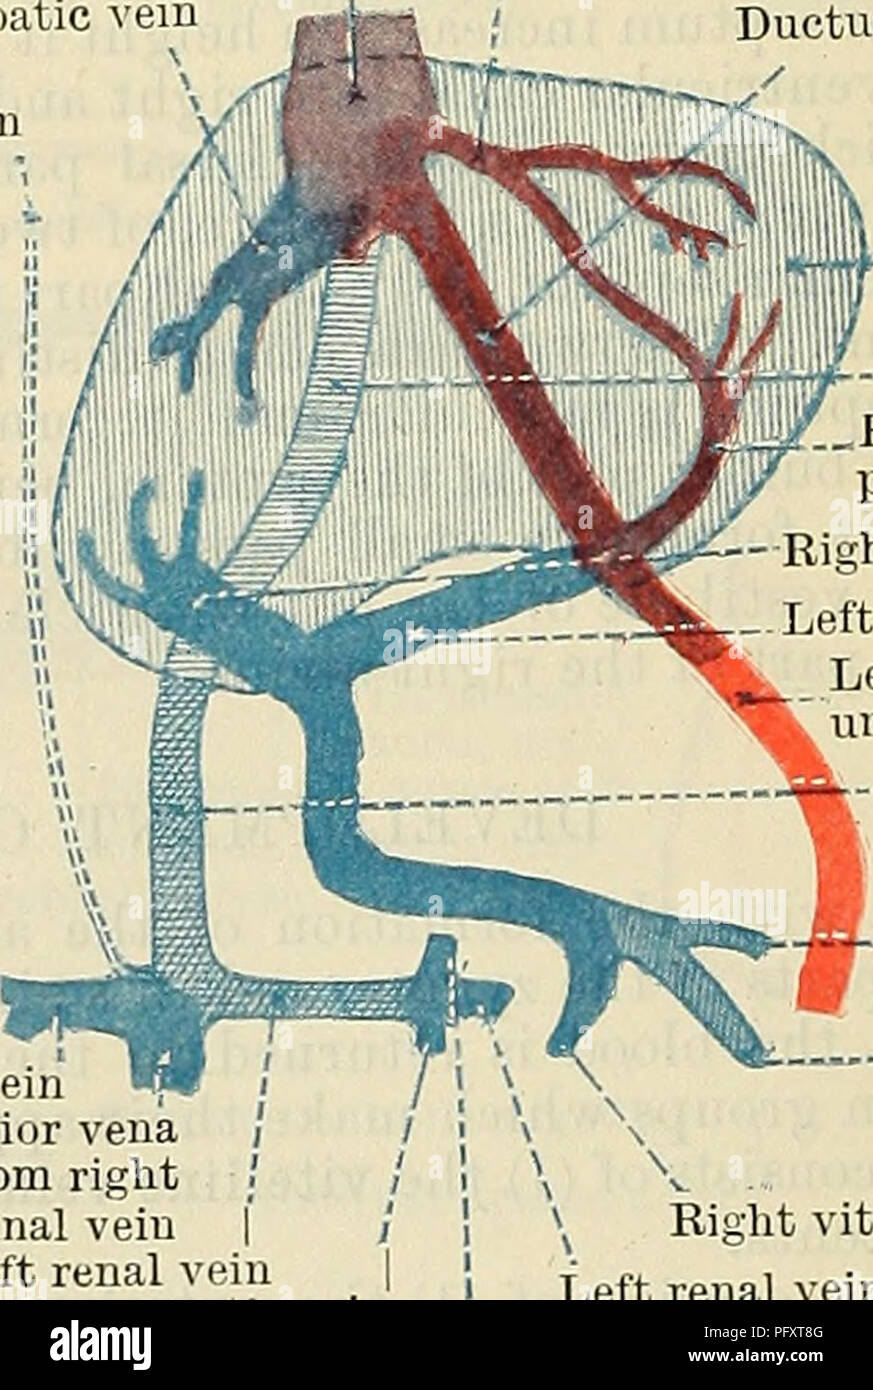 Cunninghams Lehrbuch der Anatomie. Anatomie. Links lateral Nabelvene ...